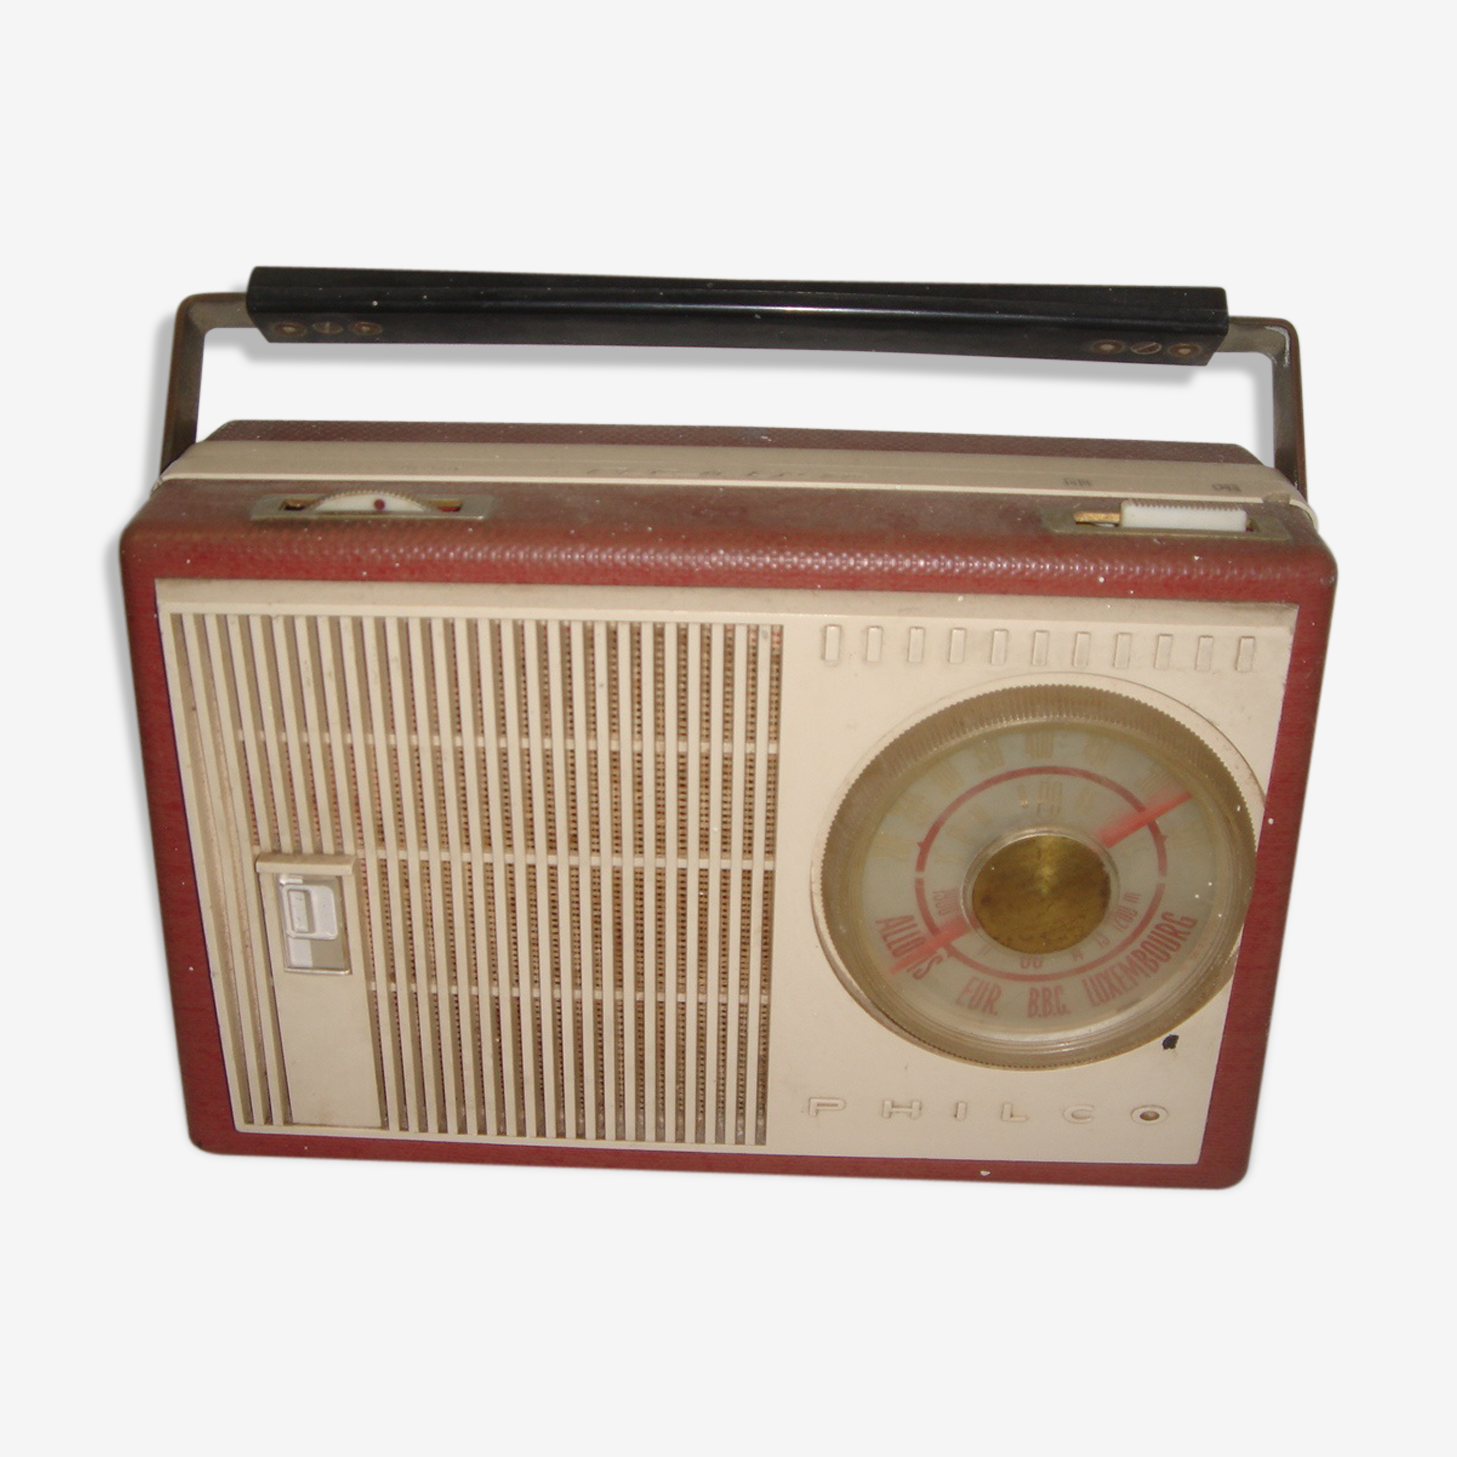 Poste radio Philco Harlem de 1960